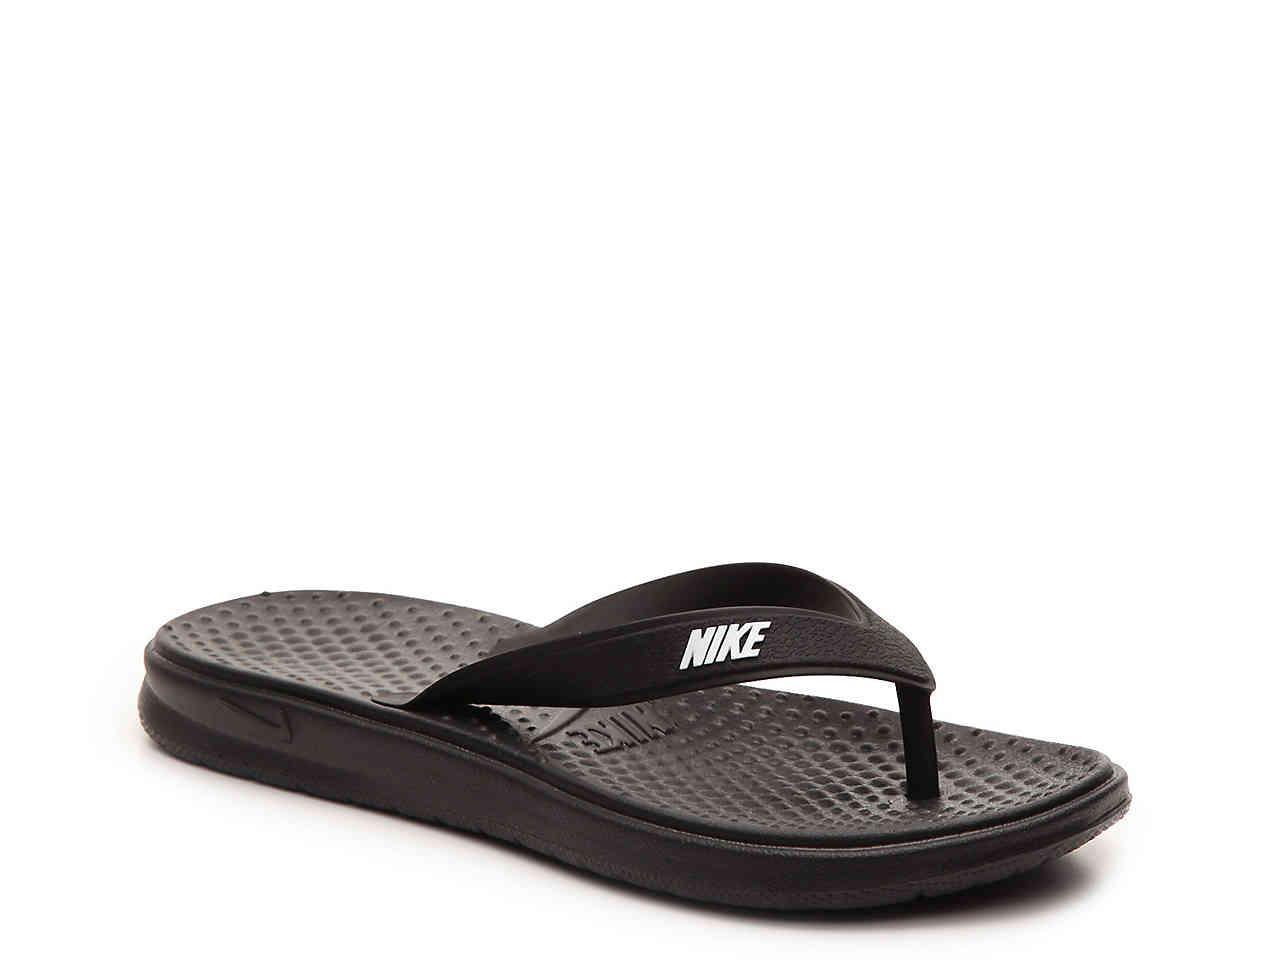 27eb1e83c238 Lyst - Nike Solay Flip Flop in Black